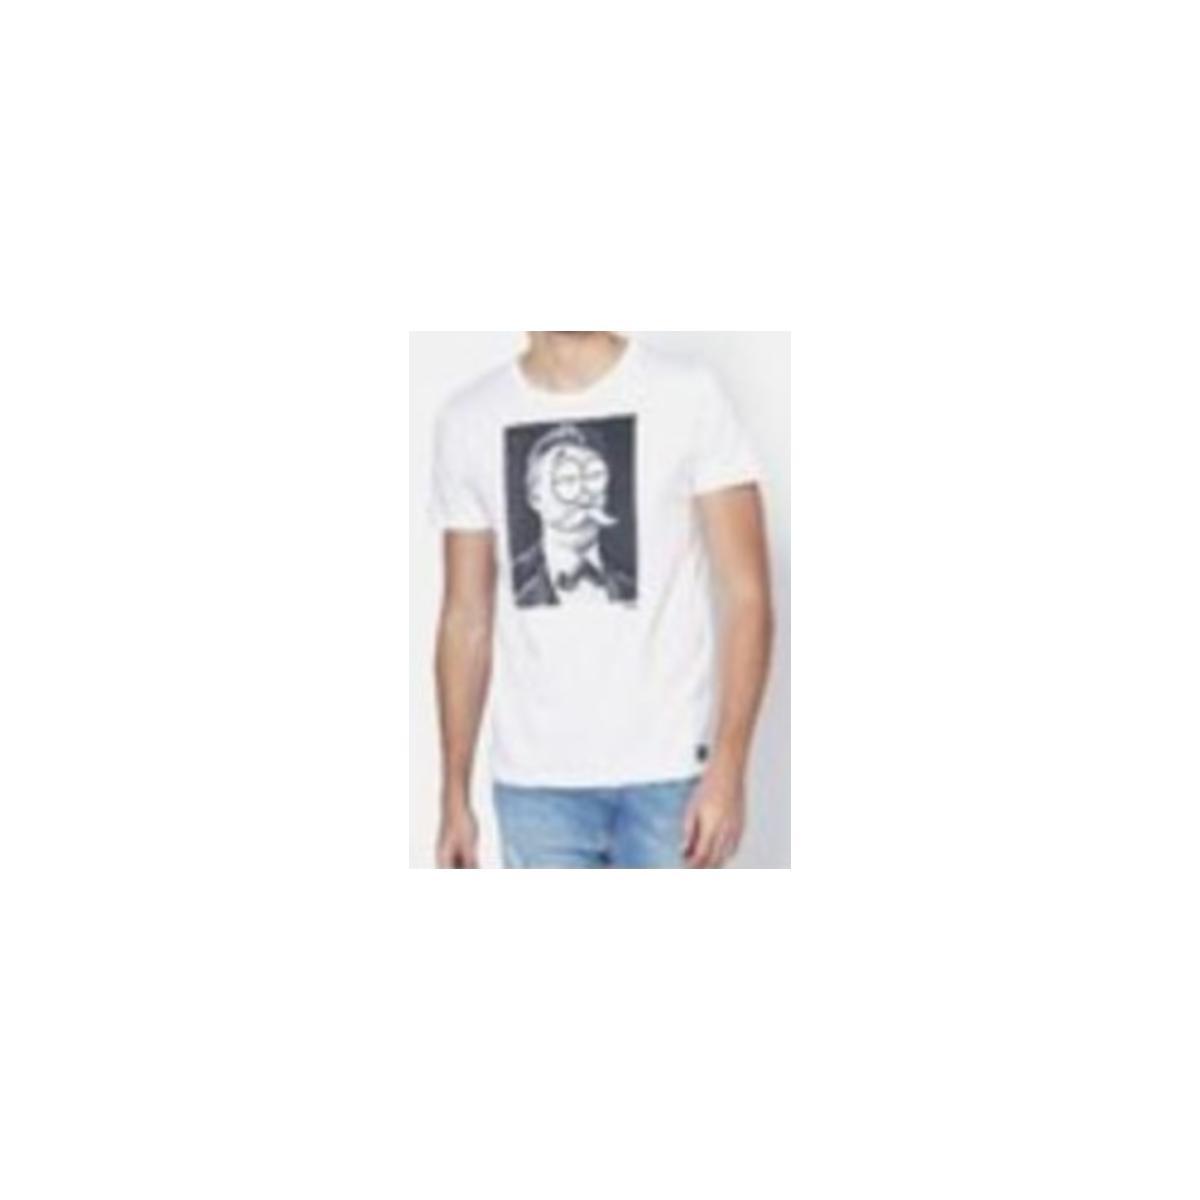 Camiseta Masculina Colcci 350108066 0001 Branco